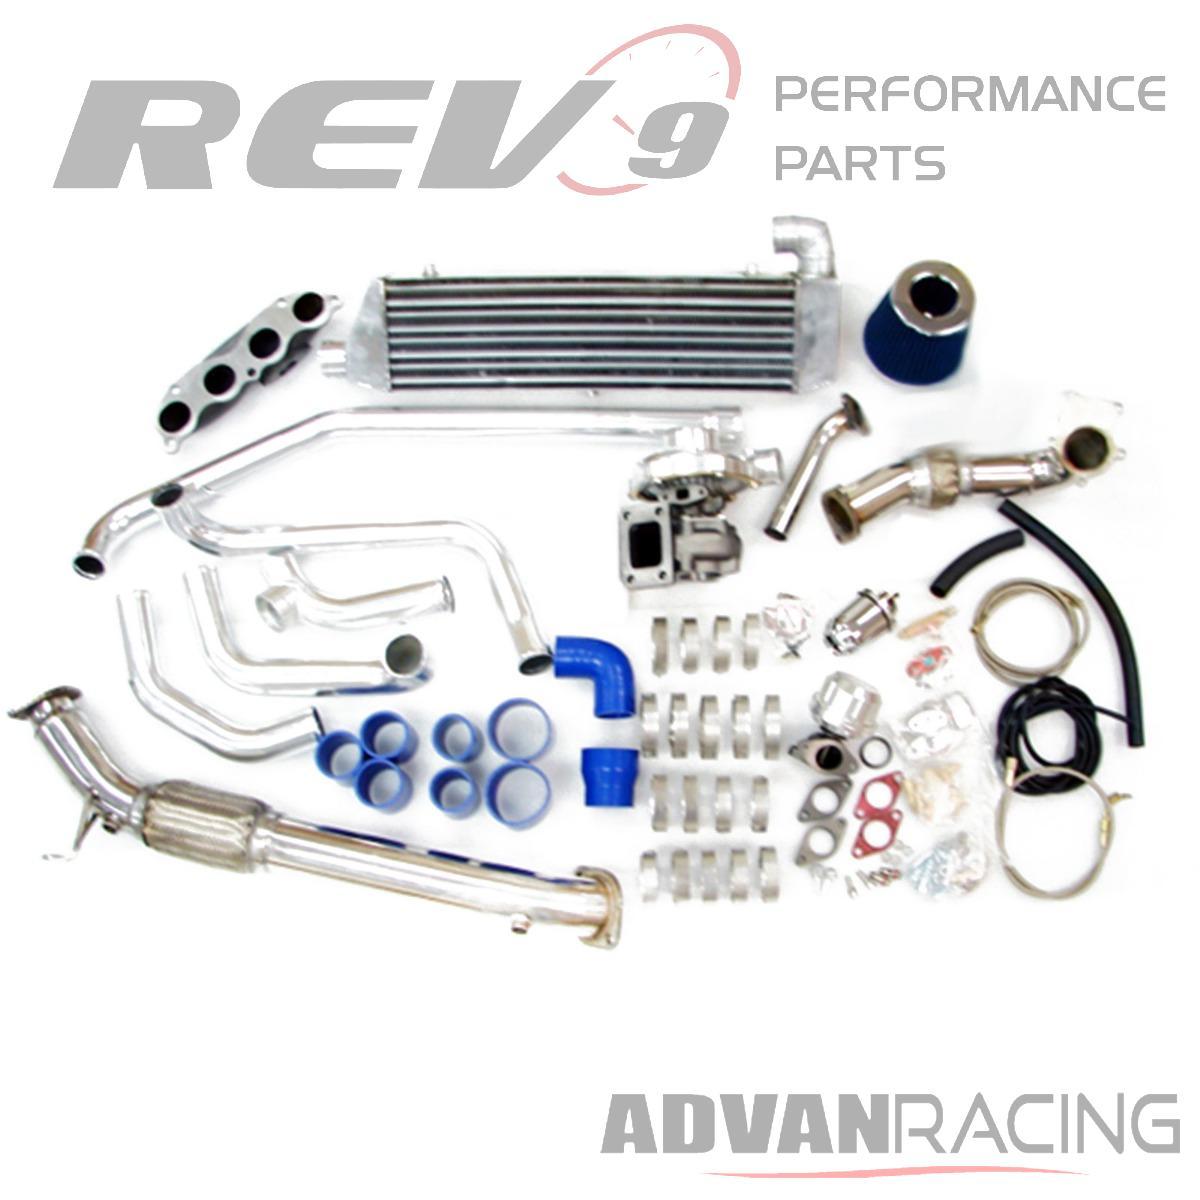 Rev9 (TCK-001) Turbo Kit Start Pack Fits Acura RSX DC5